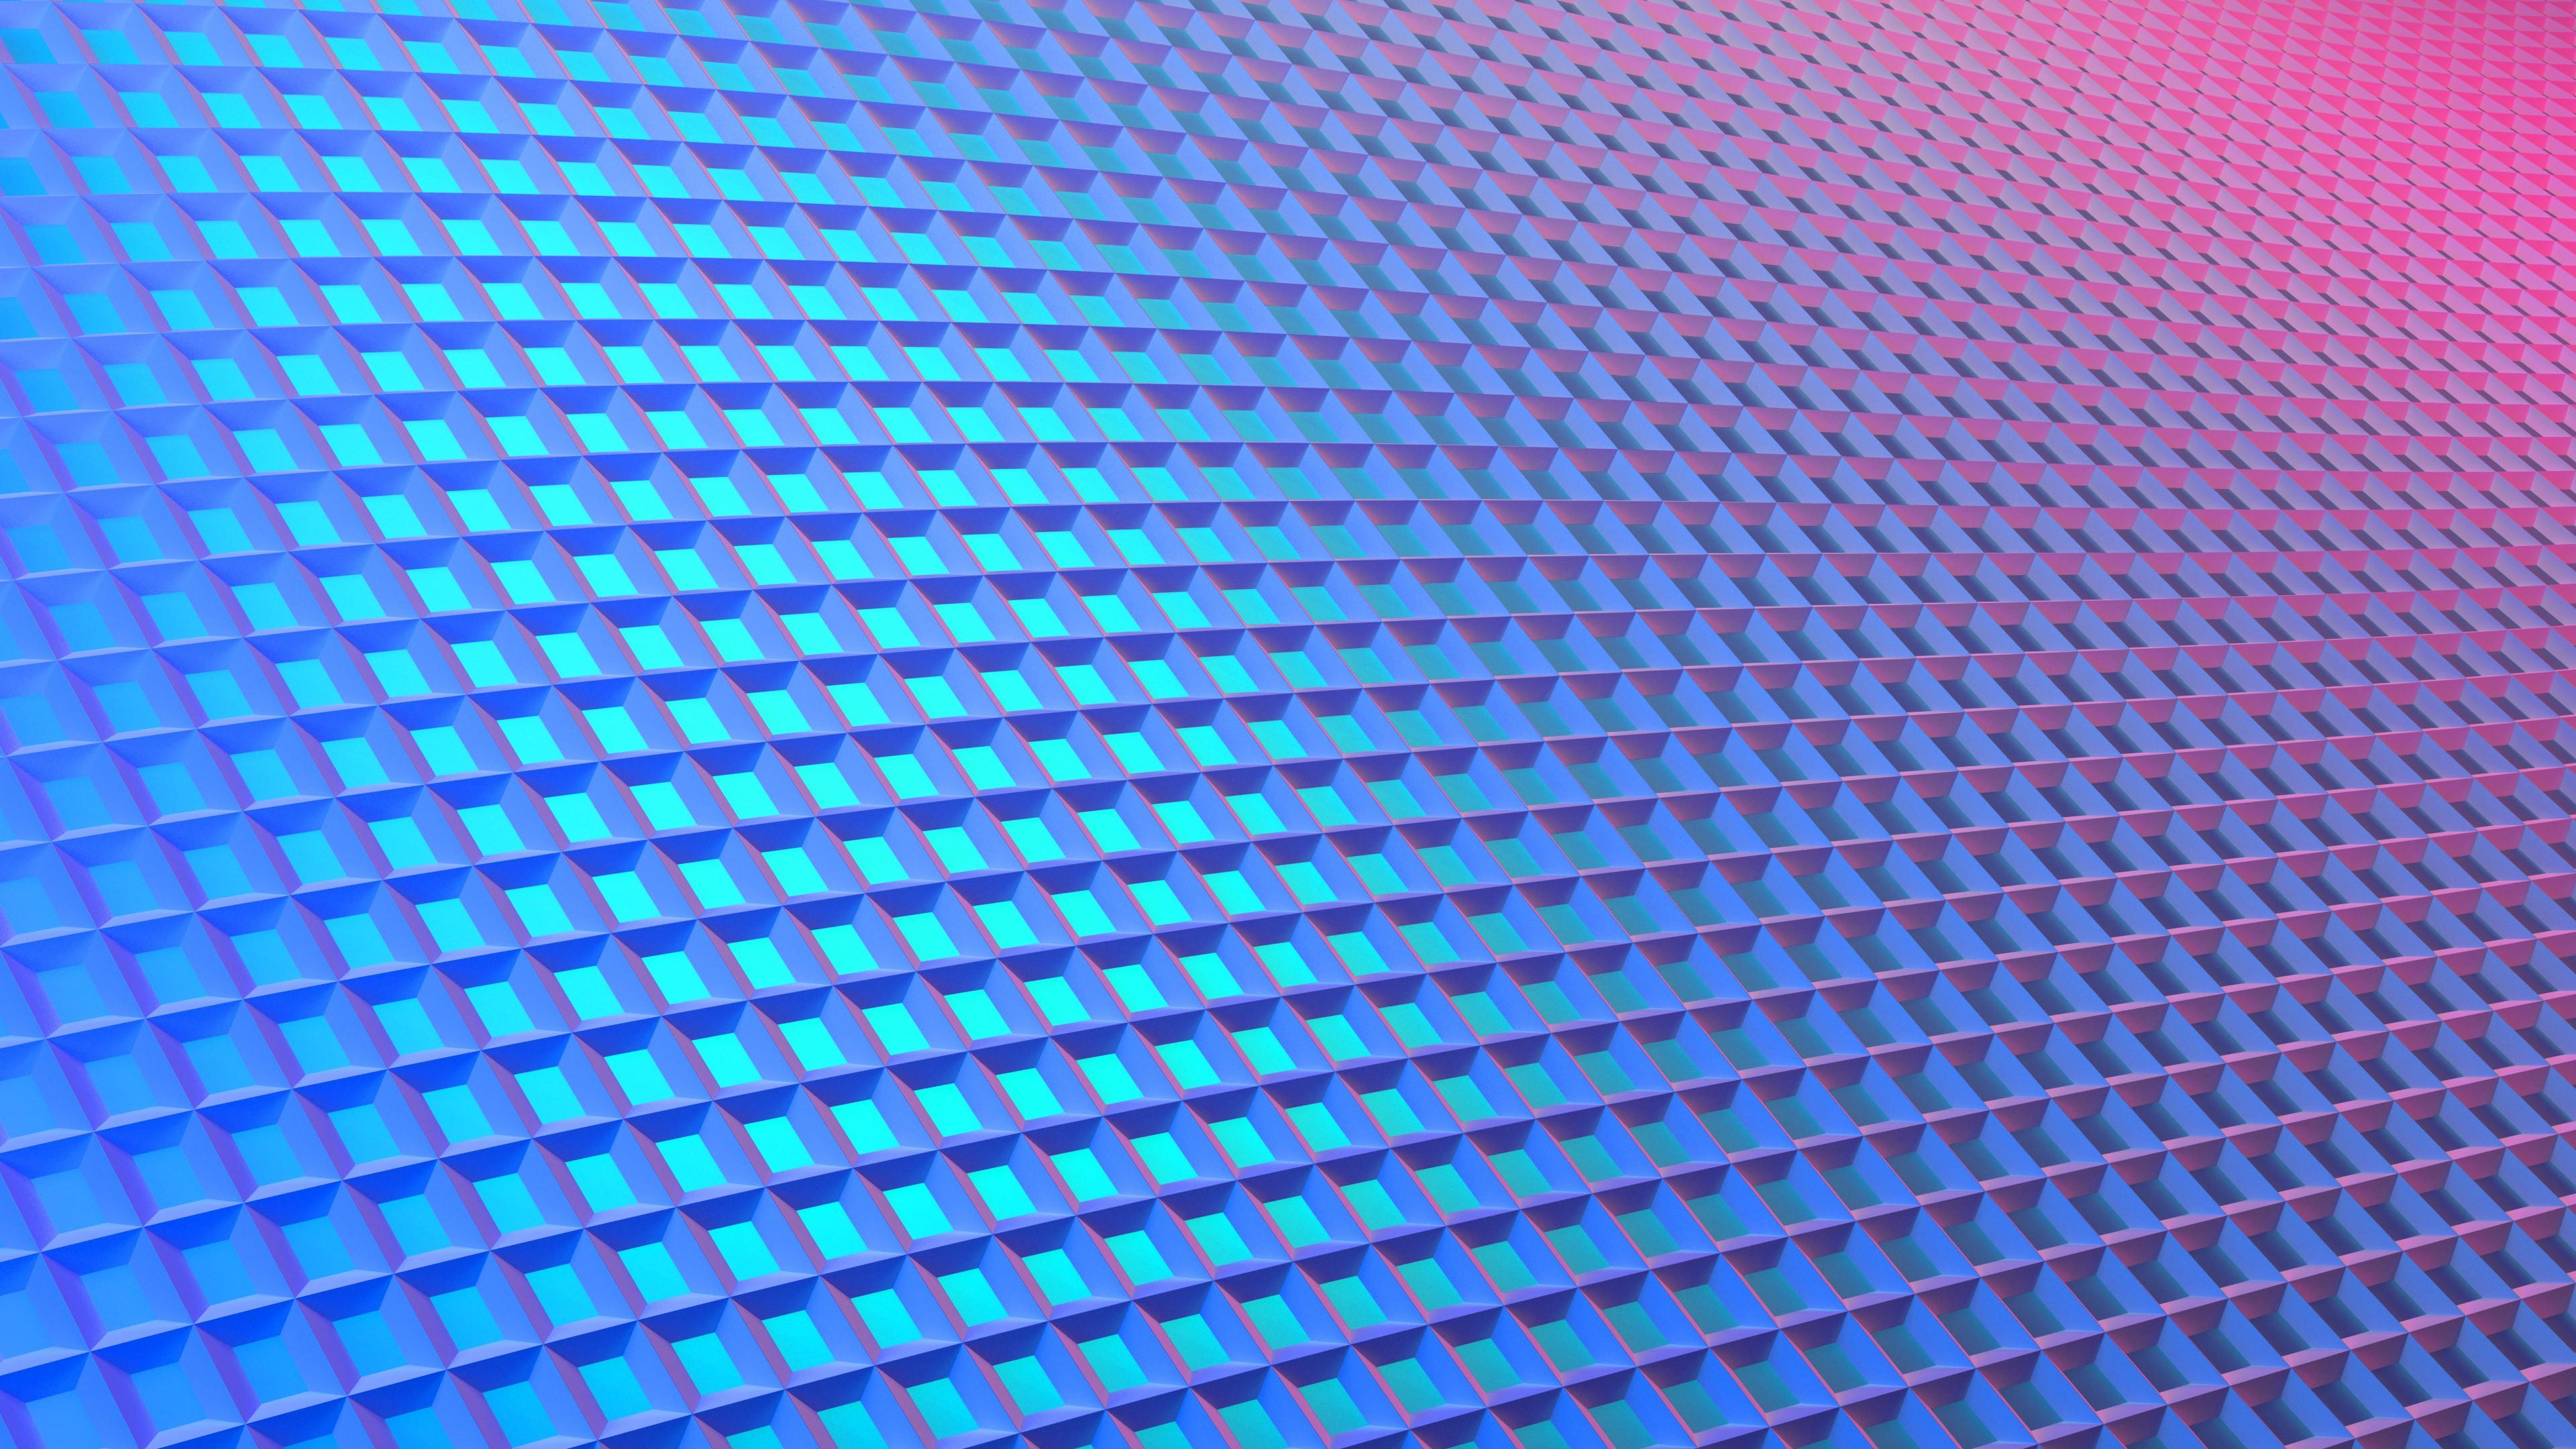 Ios Live Wallpaper Iphone X Wallpaper Iphone Wallpaper Android Wallpaper 4k 5k